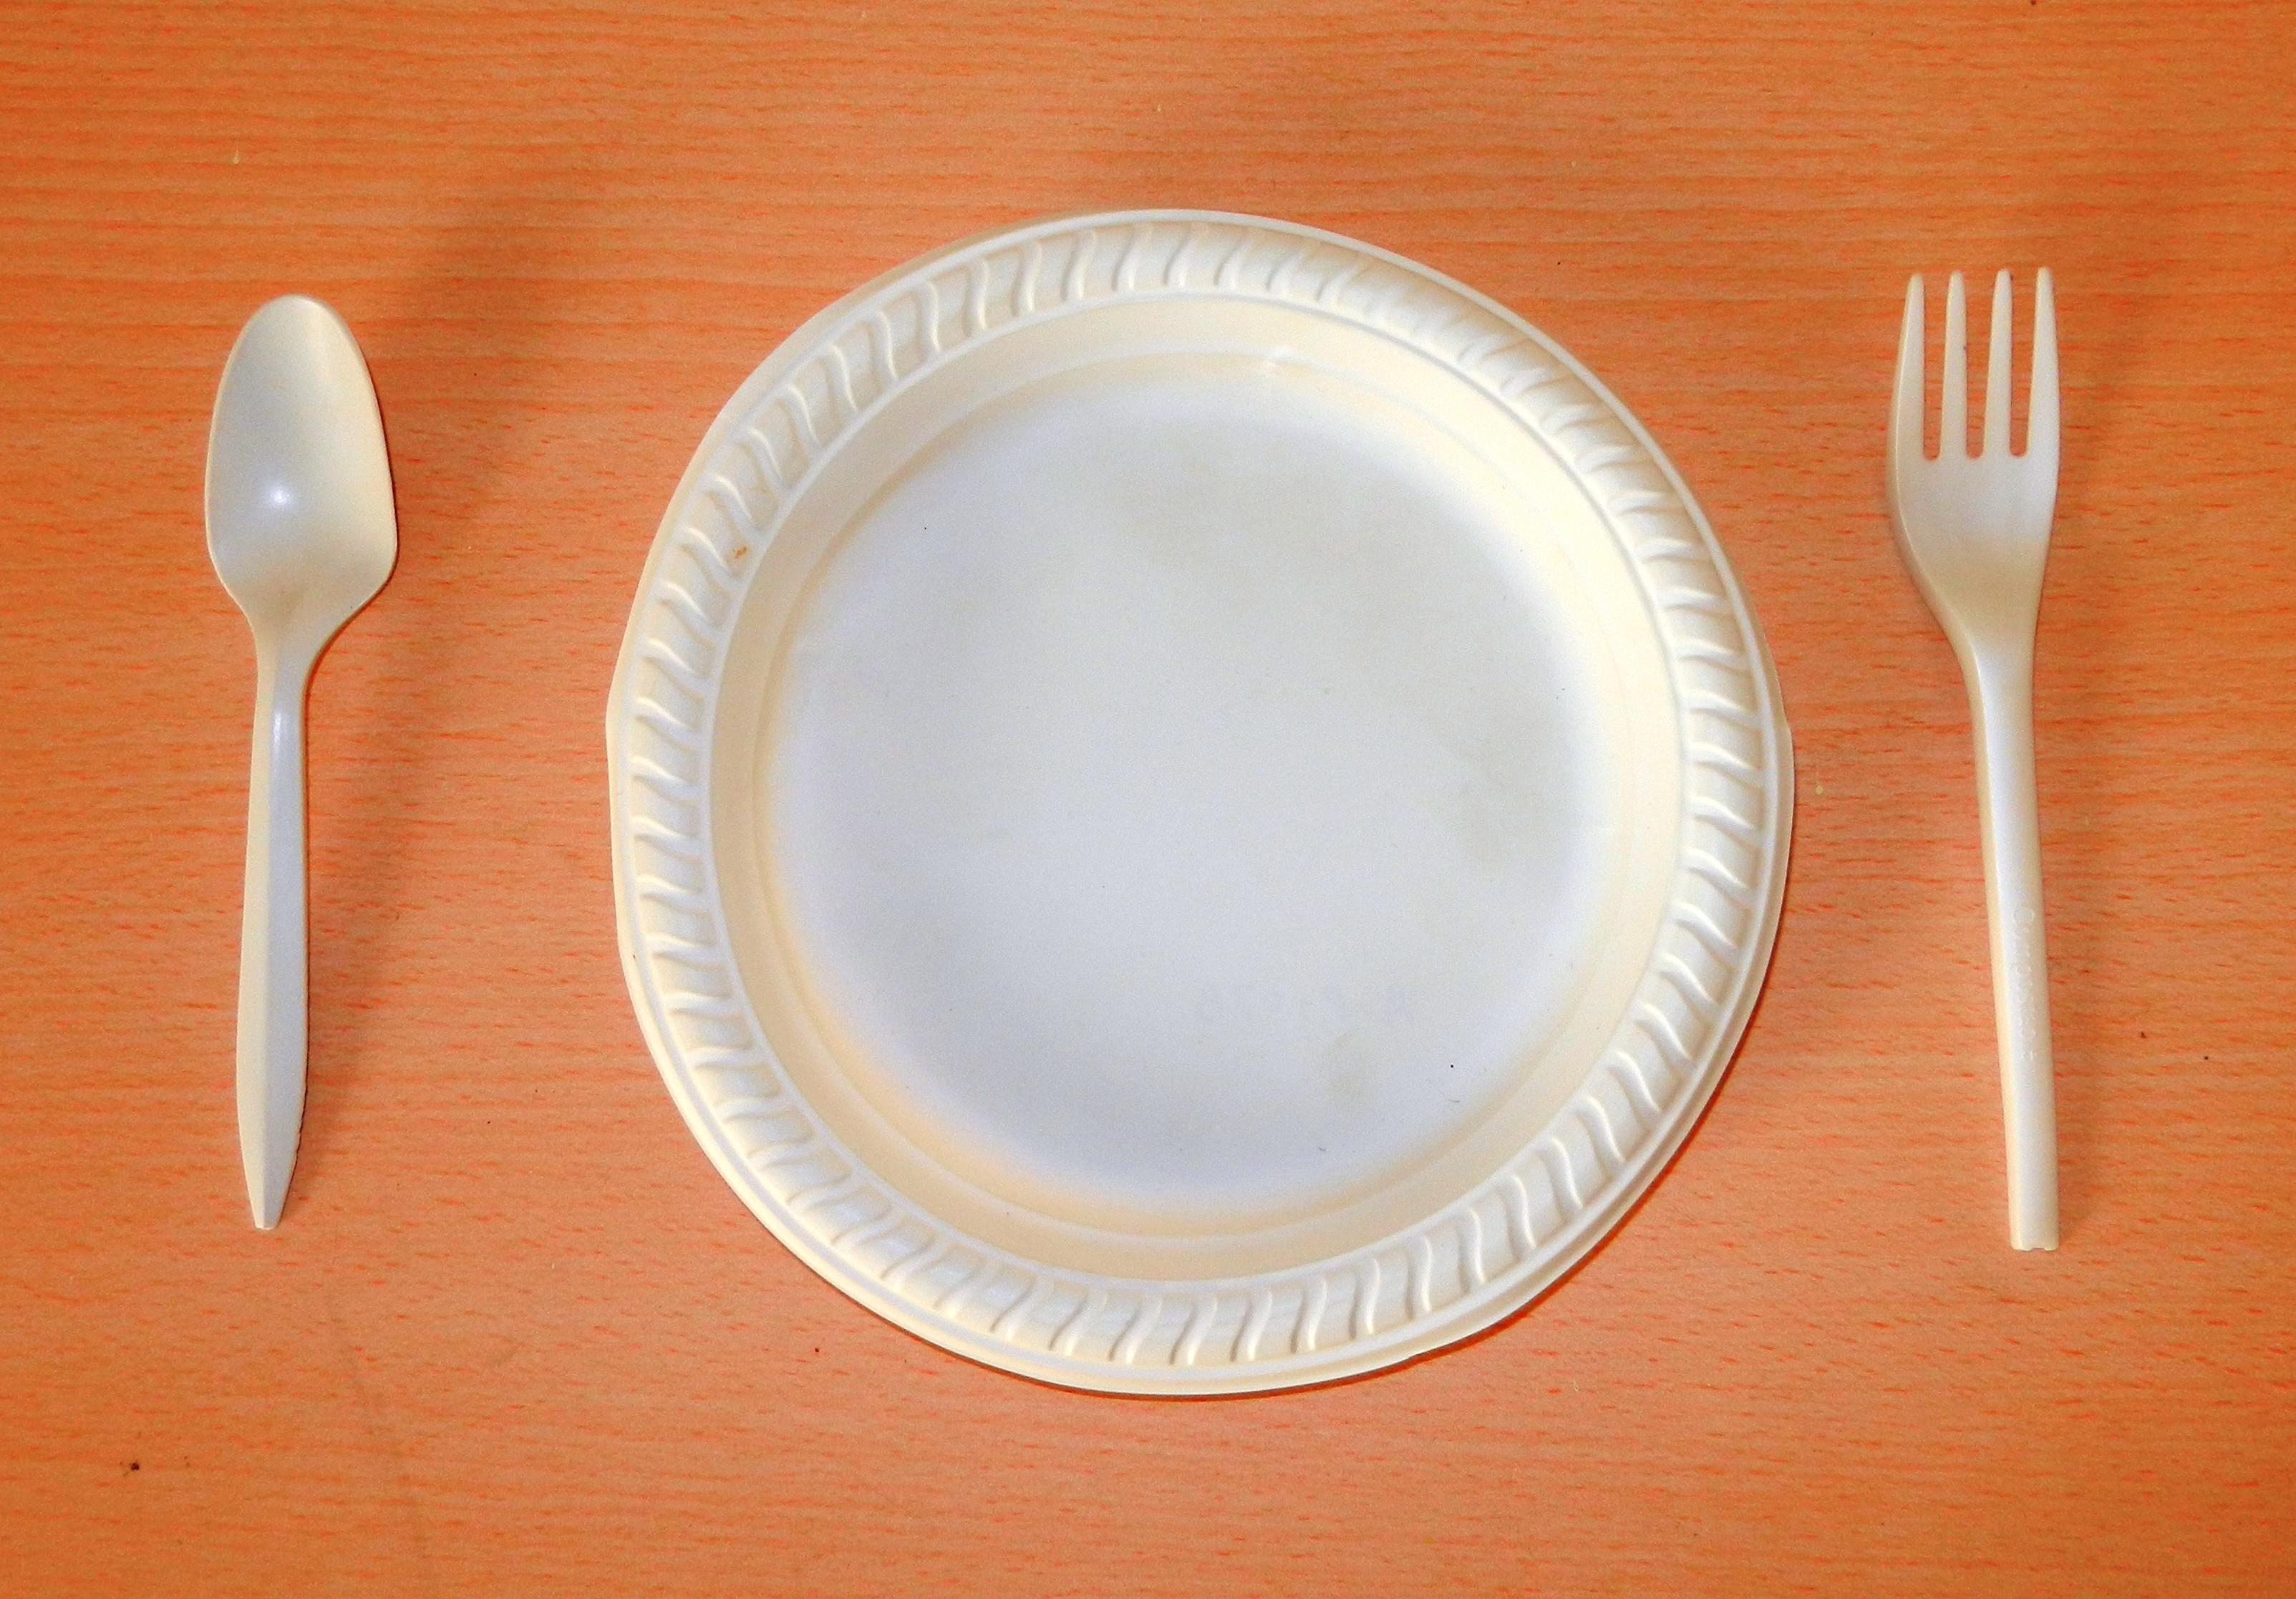 Bio Degradbale Plates And Spoons Gogreenmeans Com